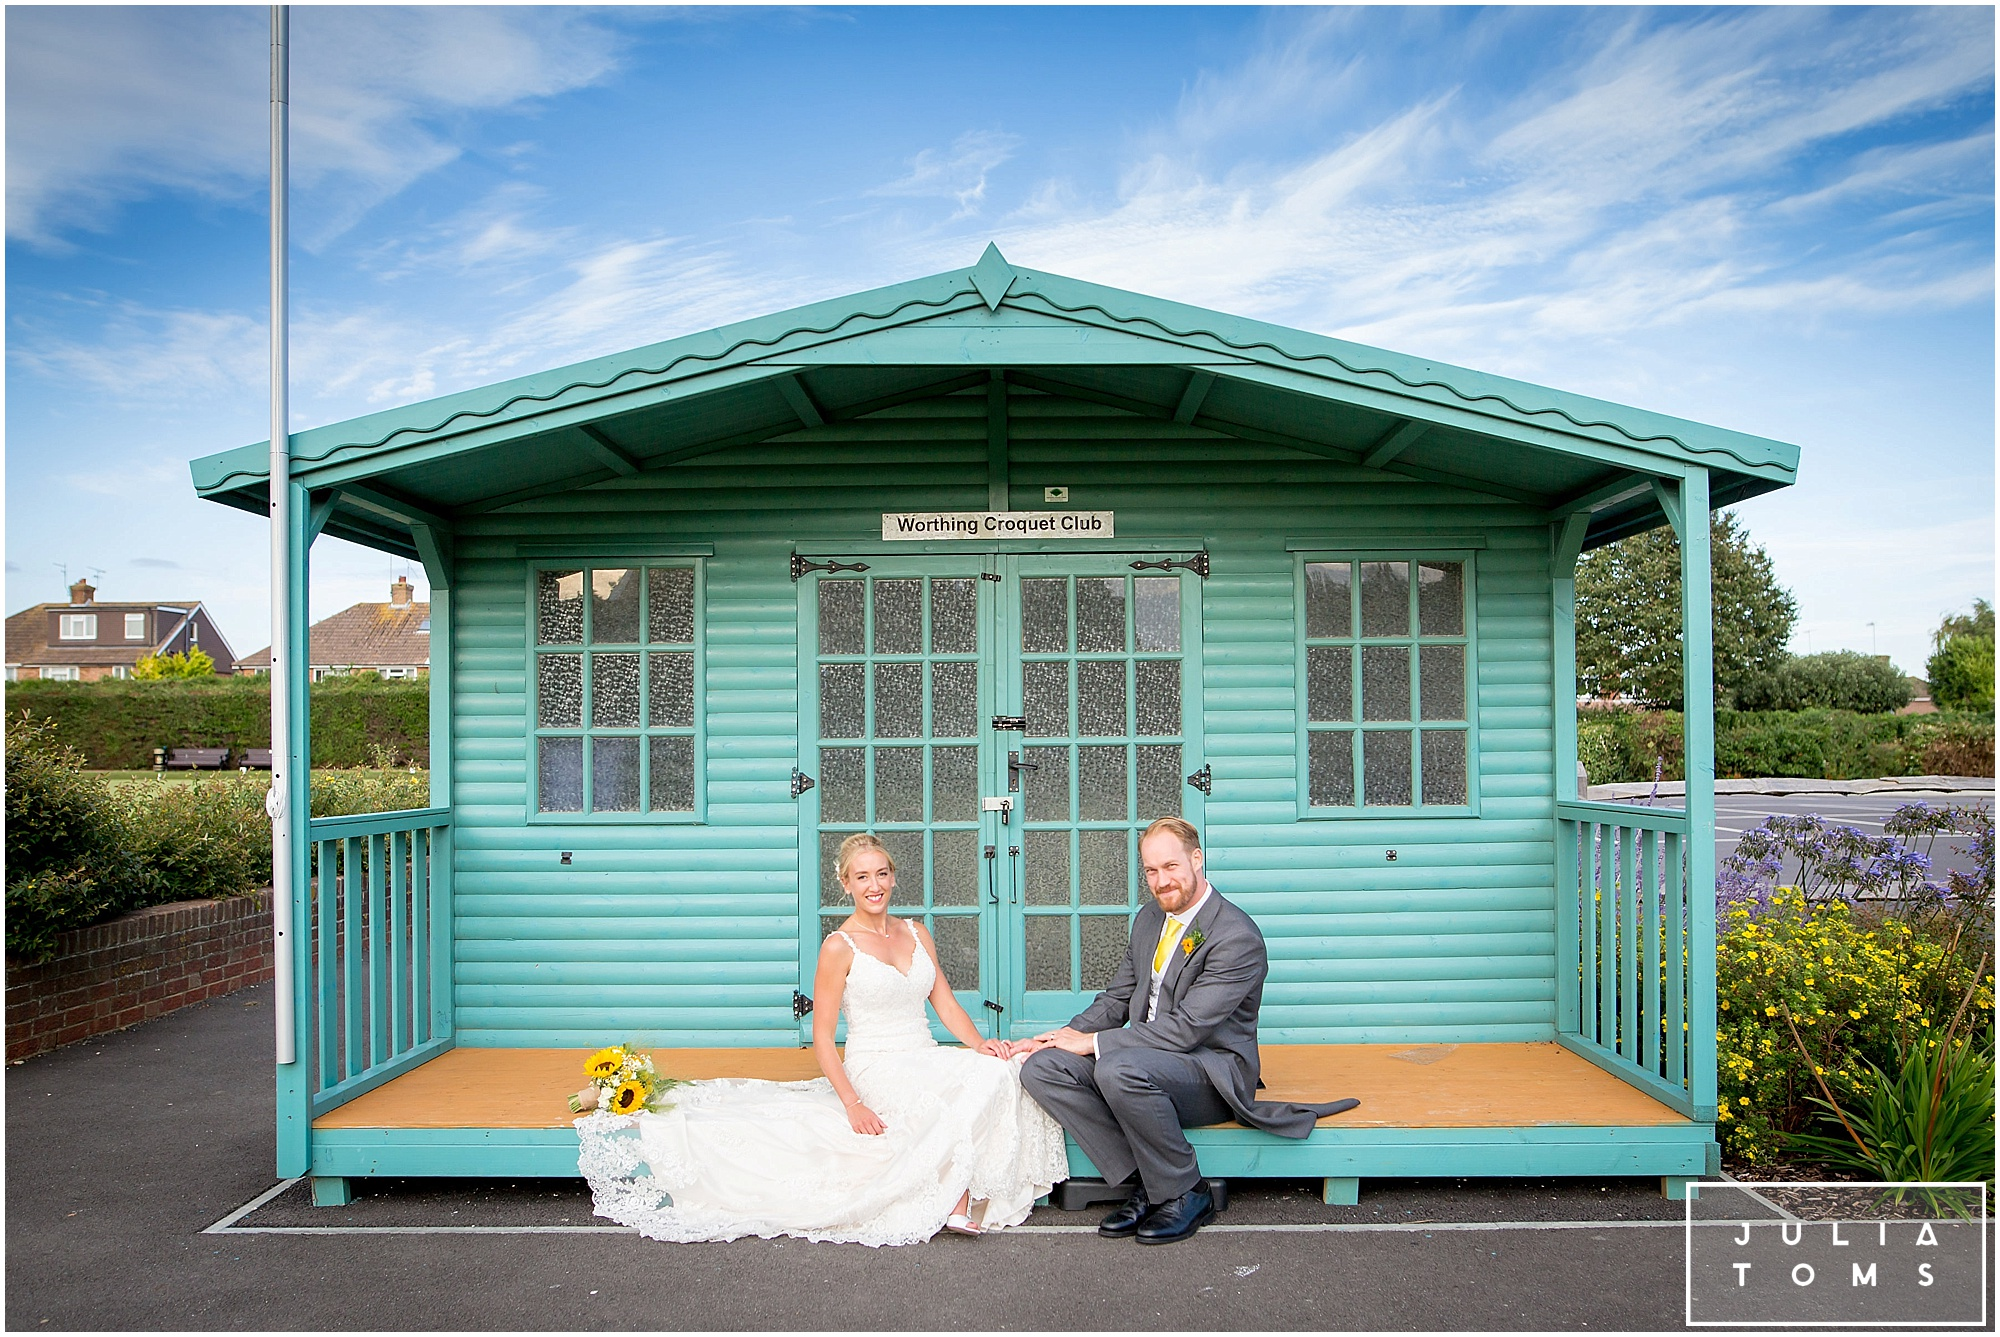 julia_toms_chichester_wedding_photographer_worthing_052.jpg